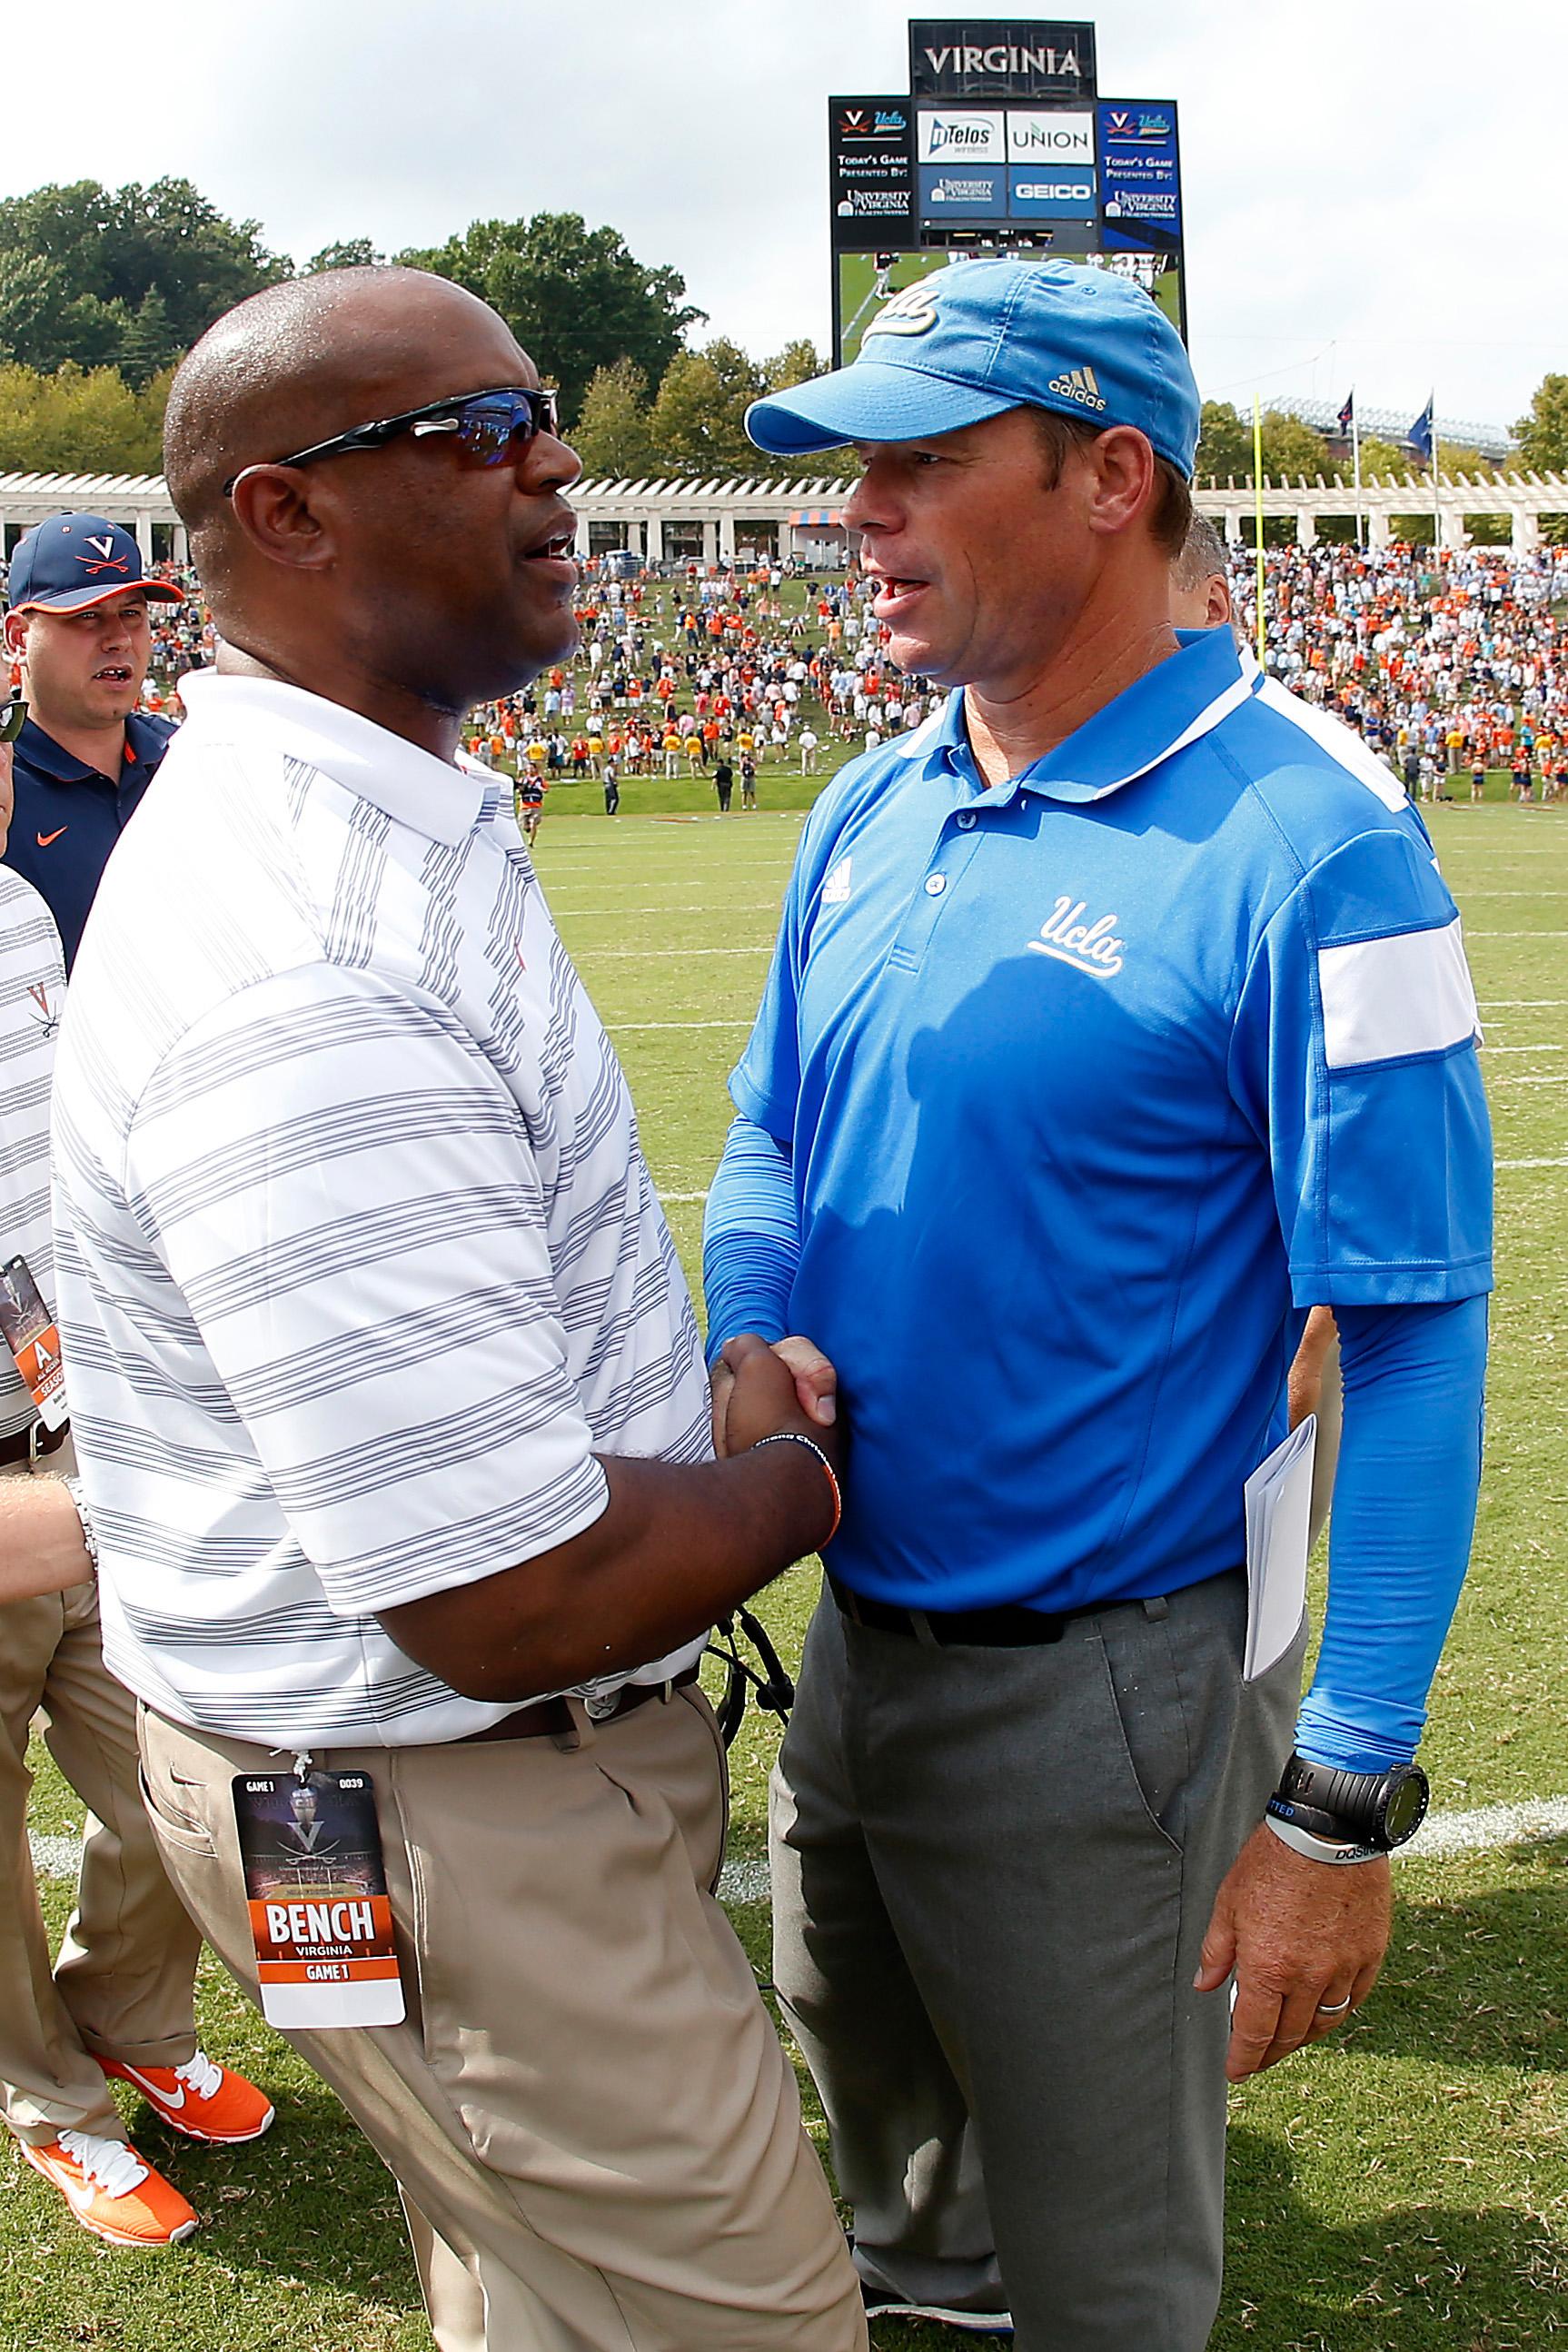 UCLA Coach Jim Mora and UVa Coach Mike London will face off again tomorrow.